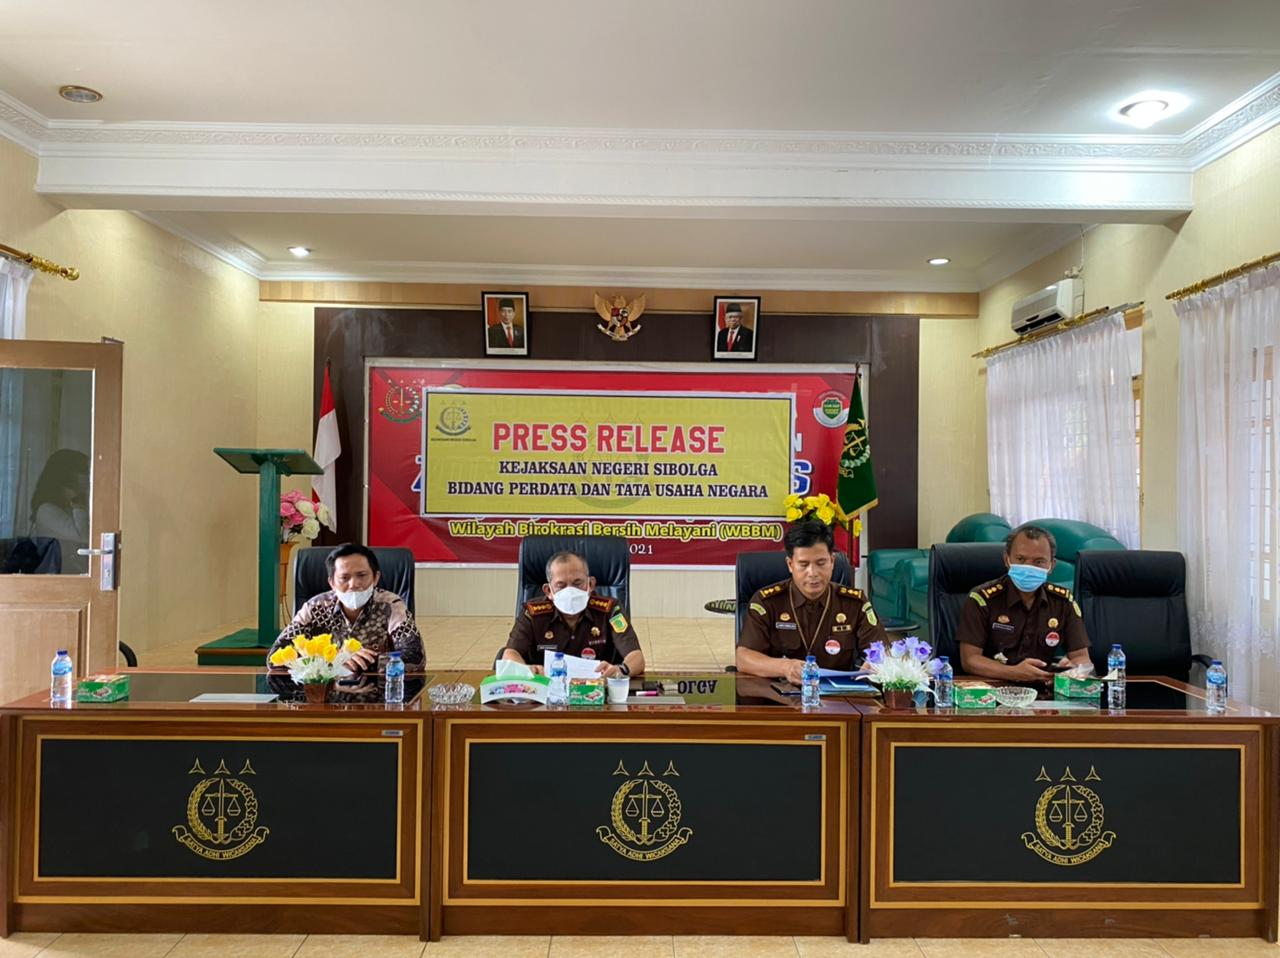 Kepala Kejaksaan Negeri Sibolga, Henri Nainggolan, Kasi datun, Kasi Intel dan Manager PLN UP 3 Sibolga, Deny Fitrianto saat pers realese. Foto: istimewa